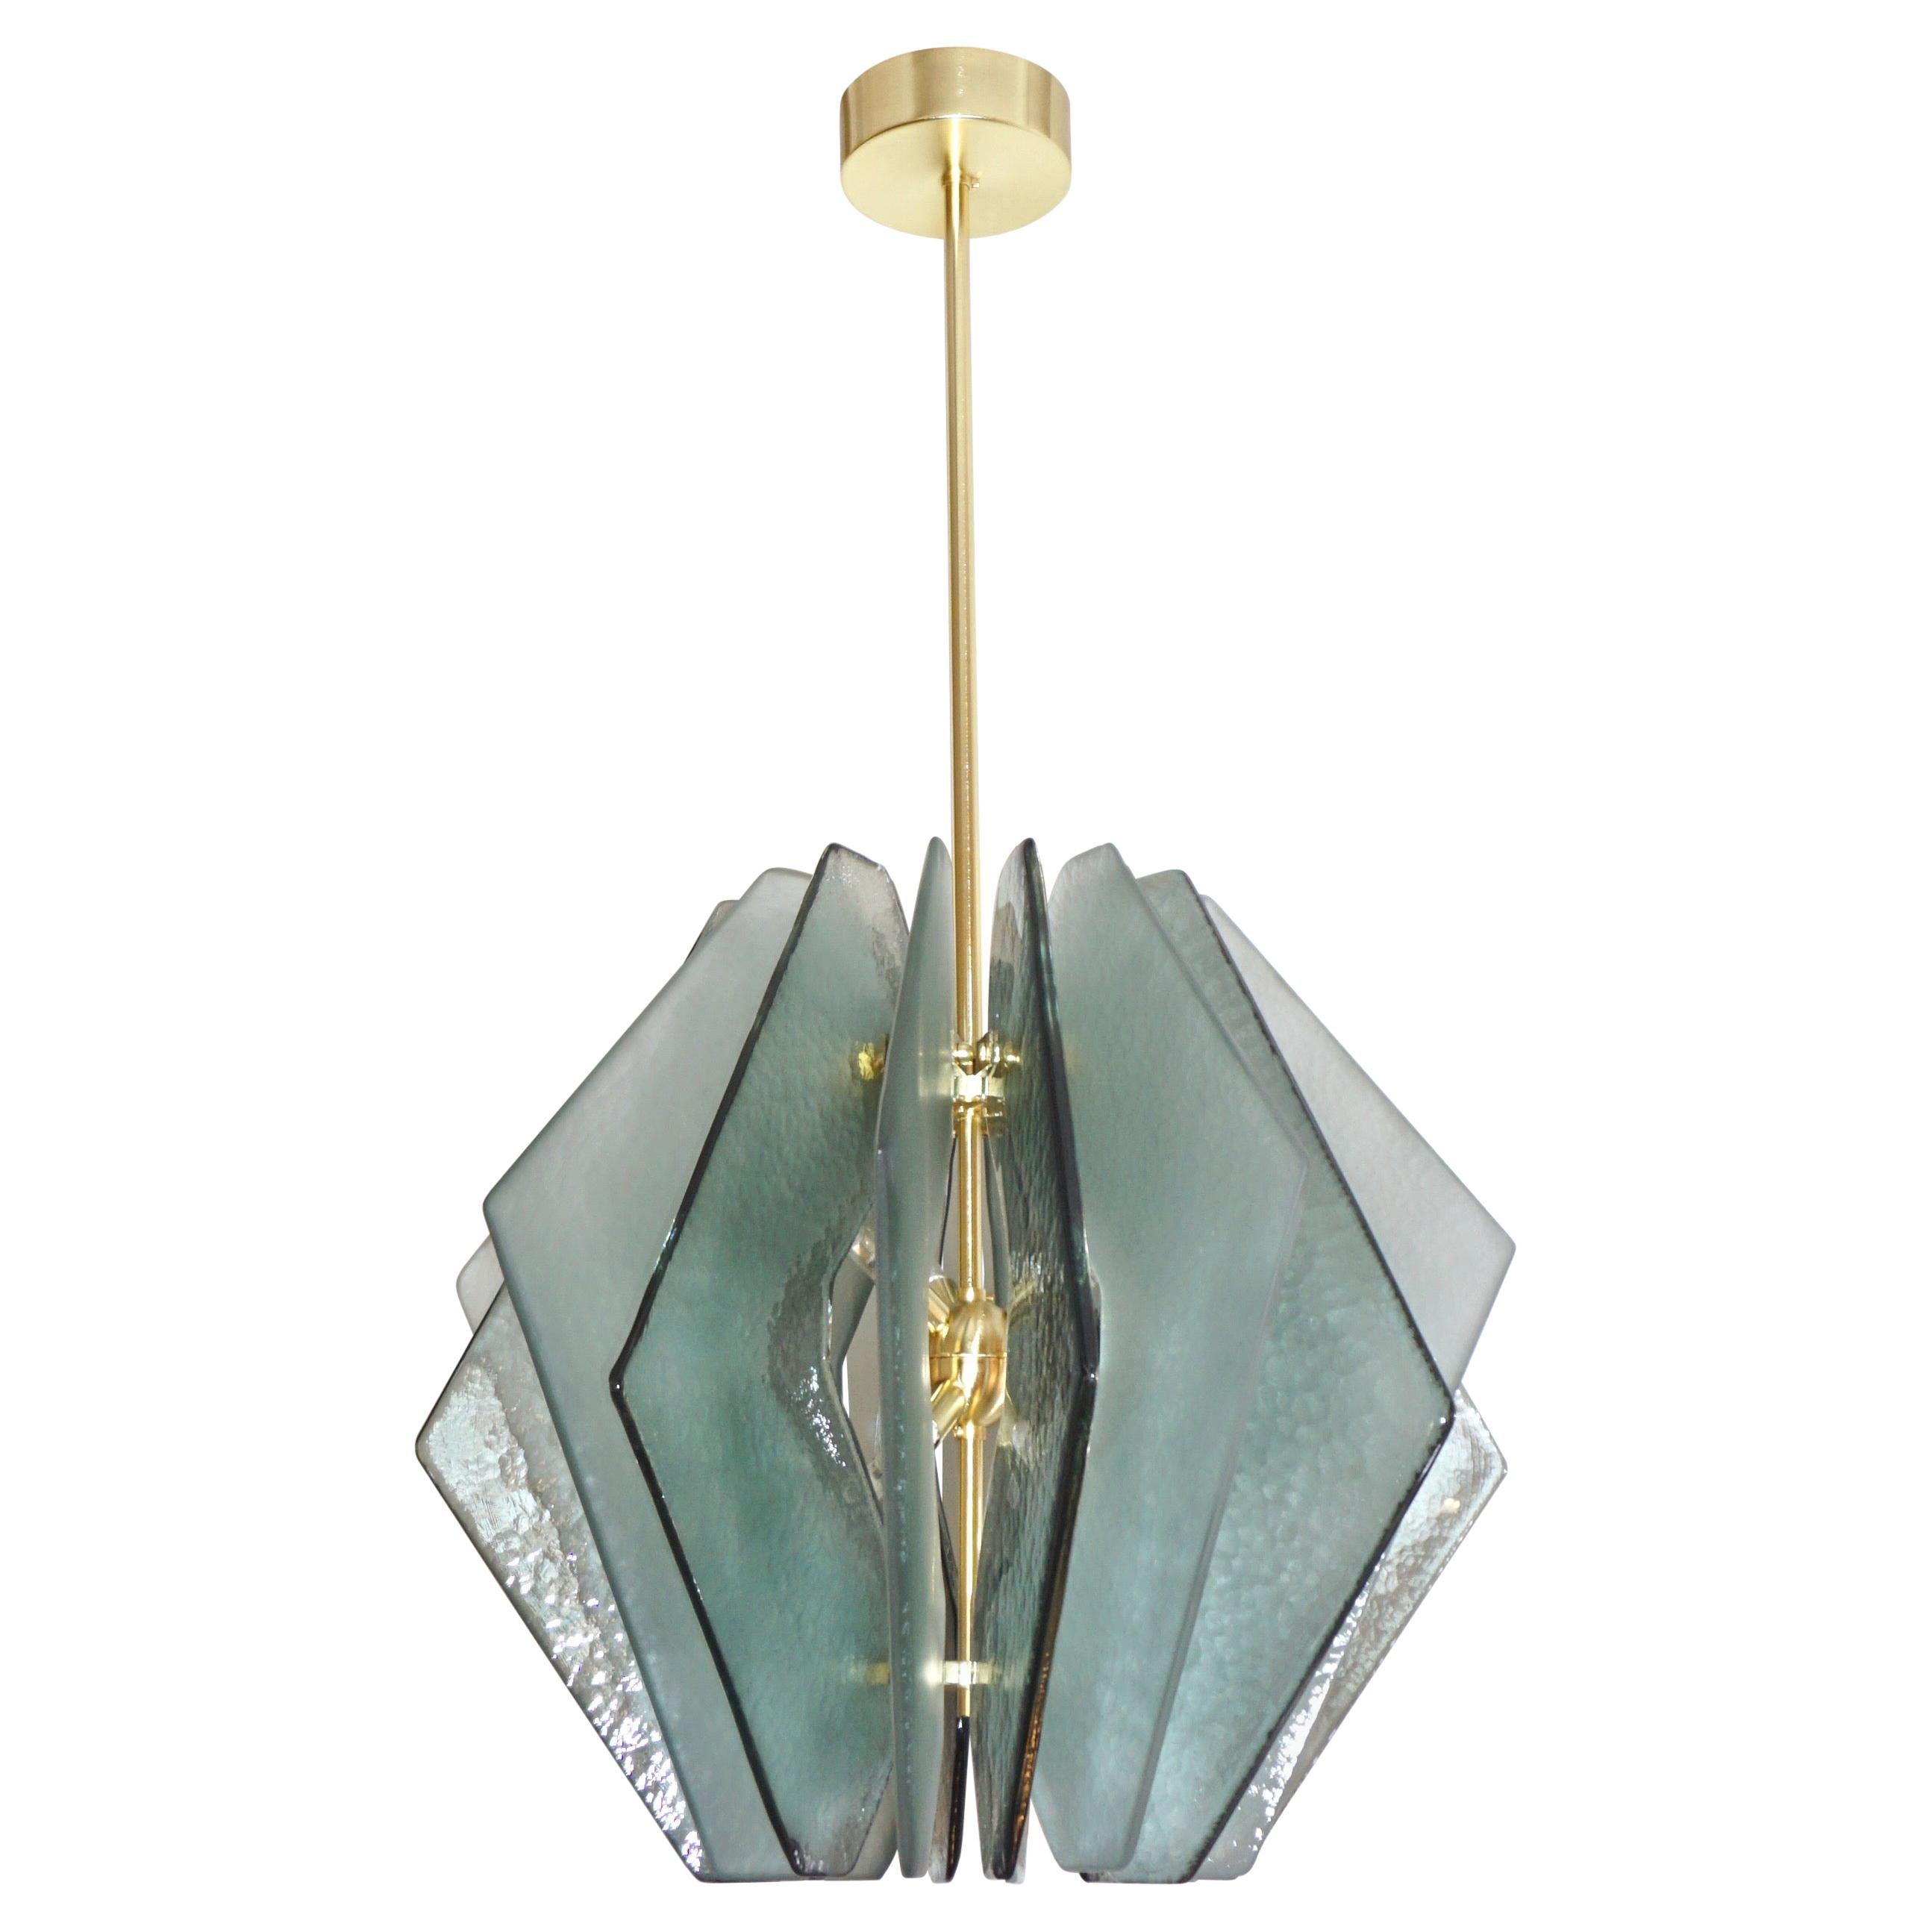 Contemporary Italian Aqua Blue Green Textured Murano Glass Pendant/Chandelier